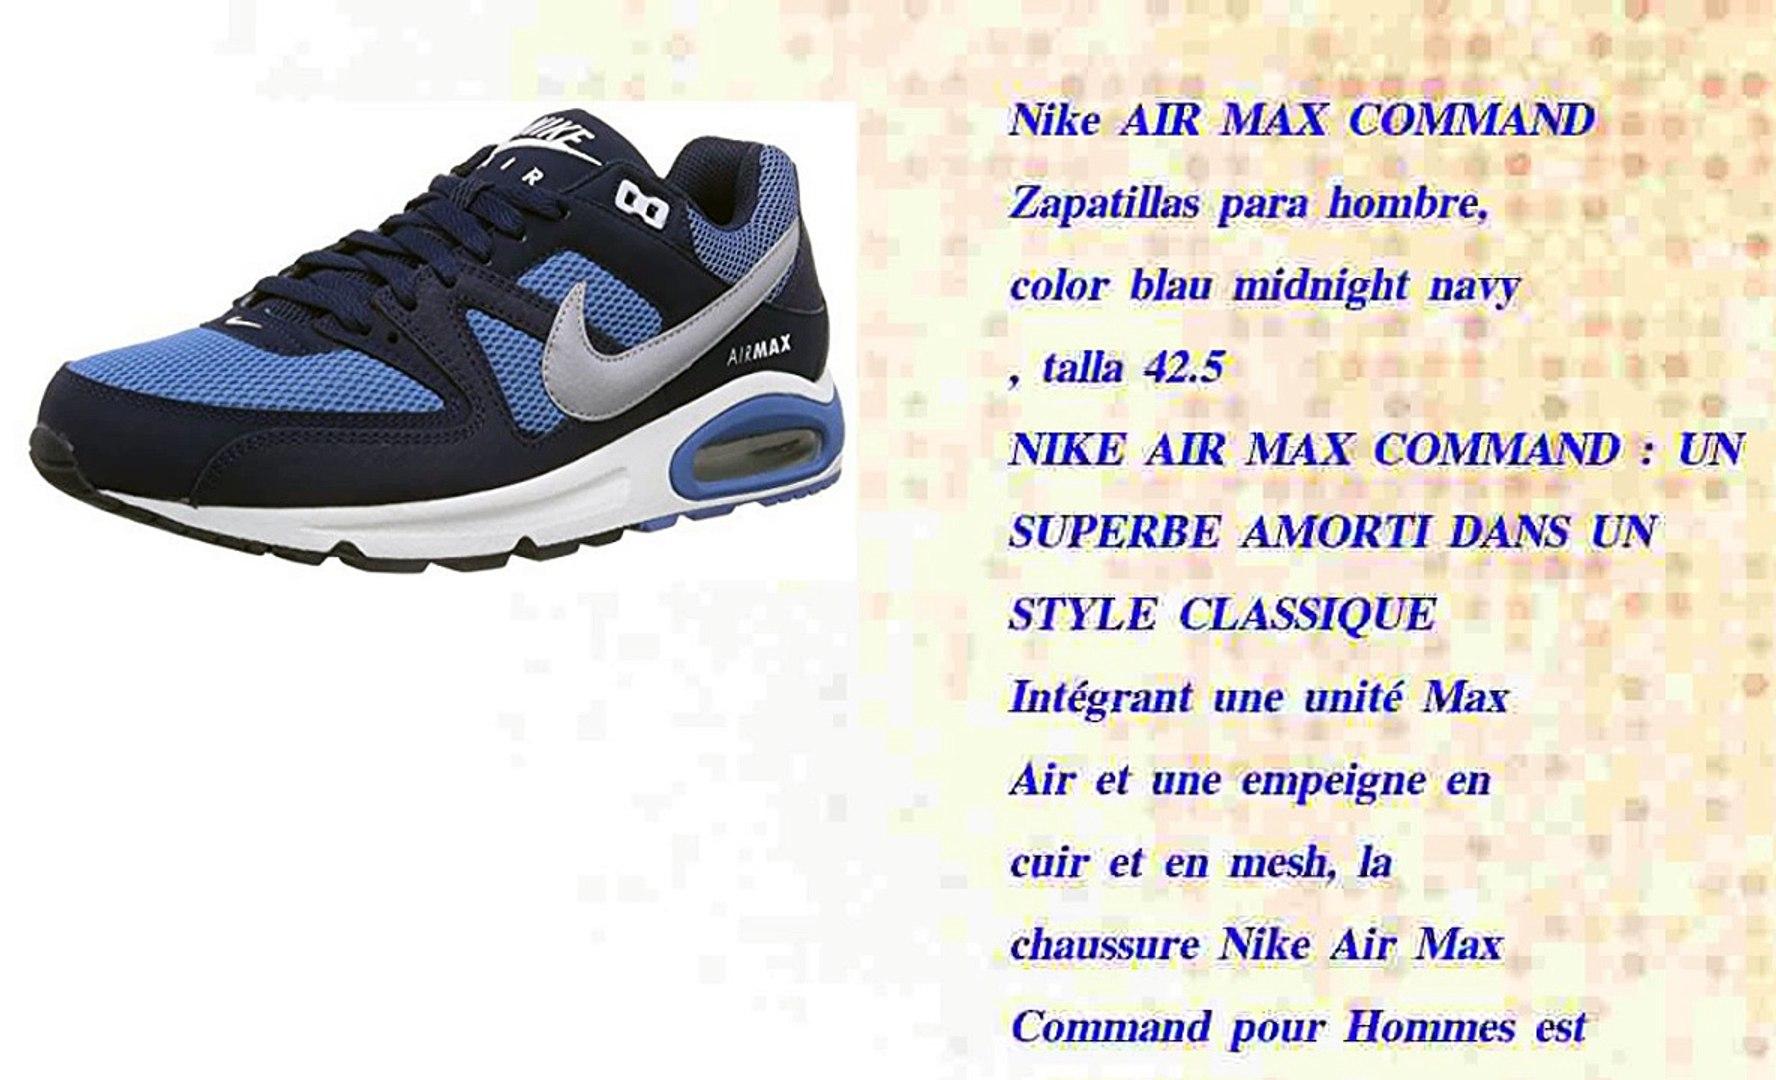 Nike AIR MAX COMMAND Zapatillas para hombre color